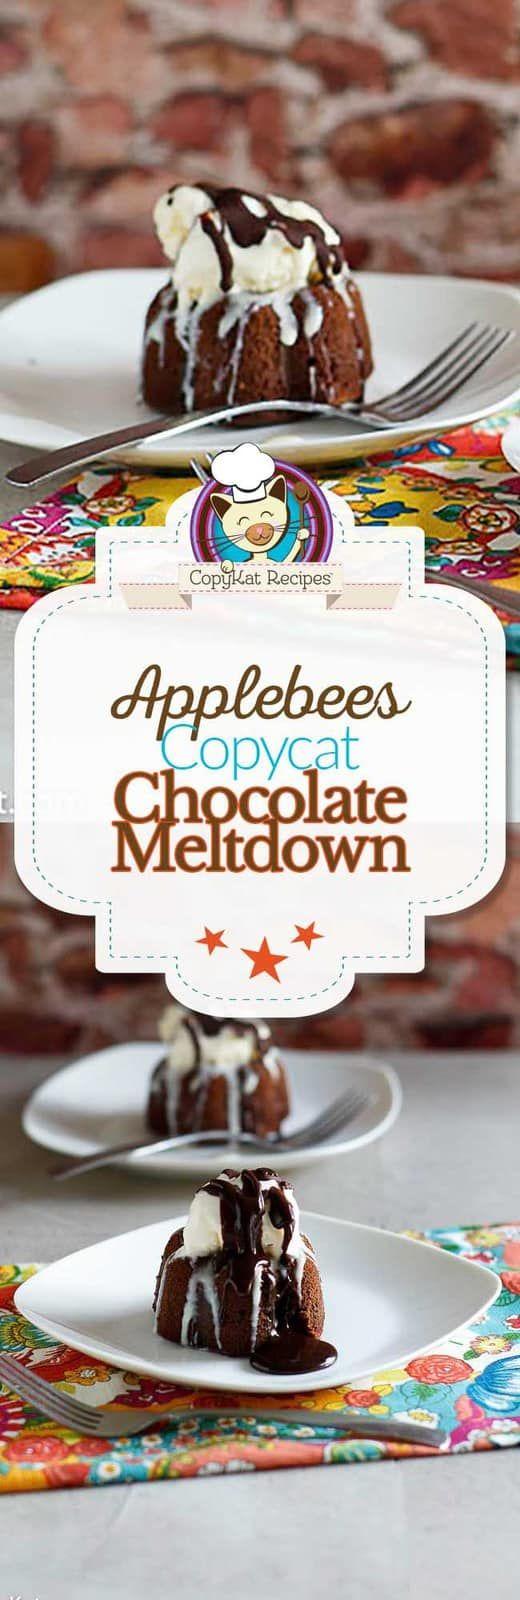 Applebees Lava Cake Recipe